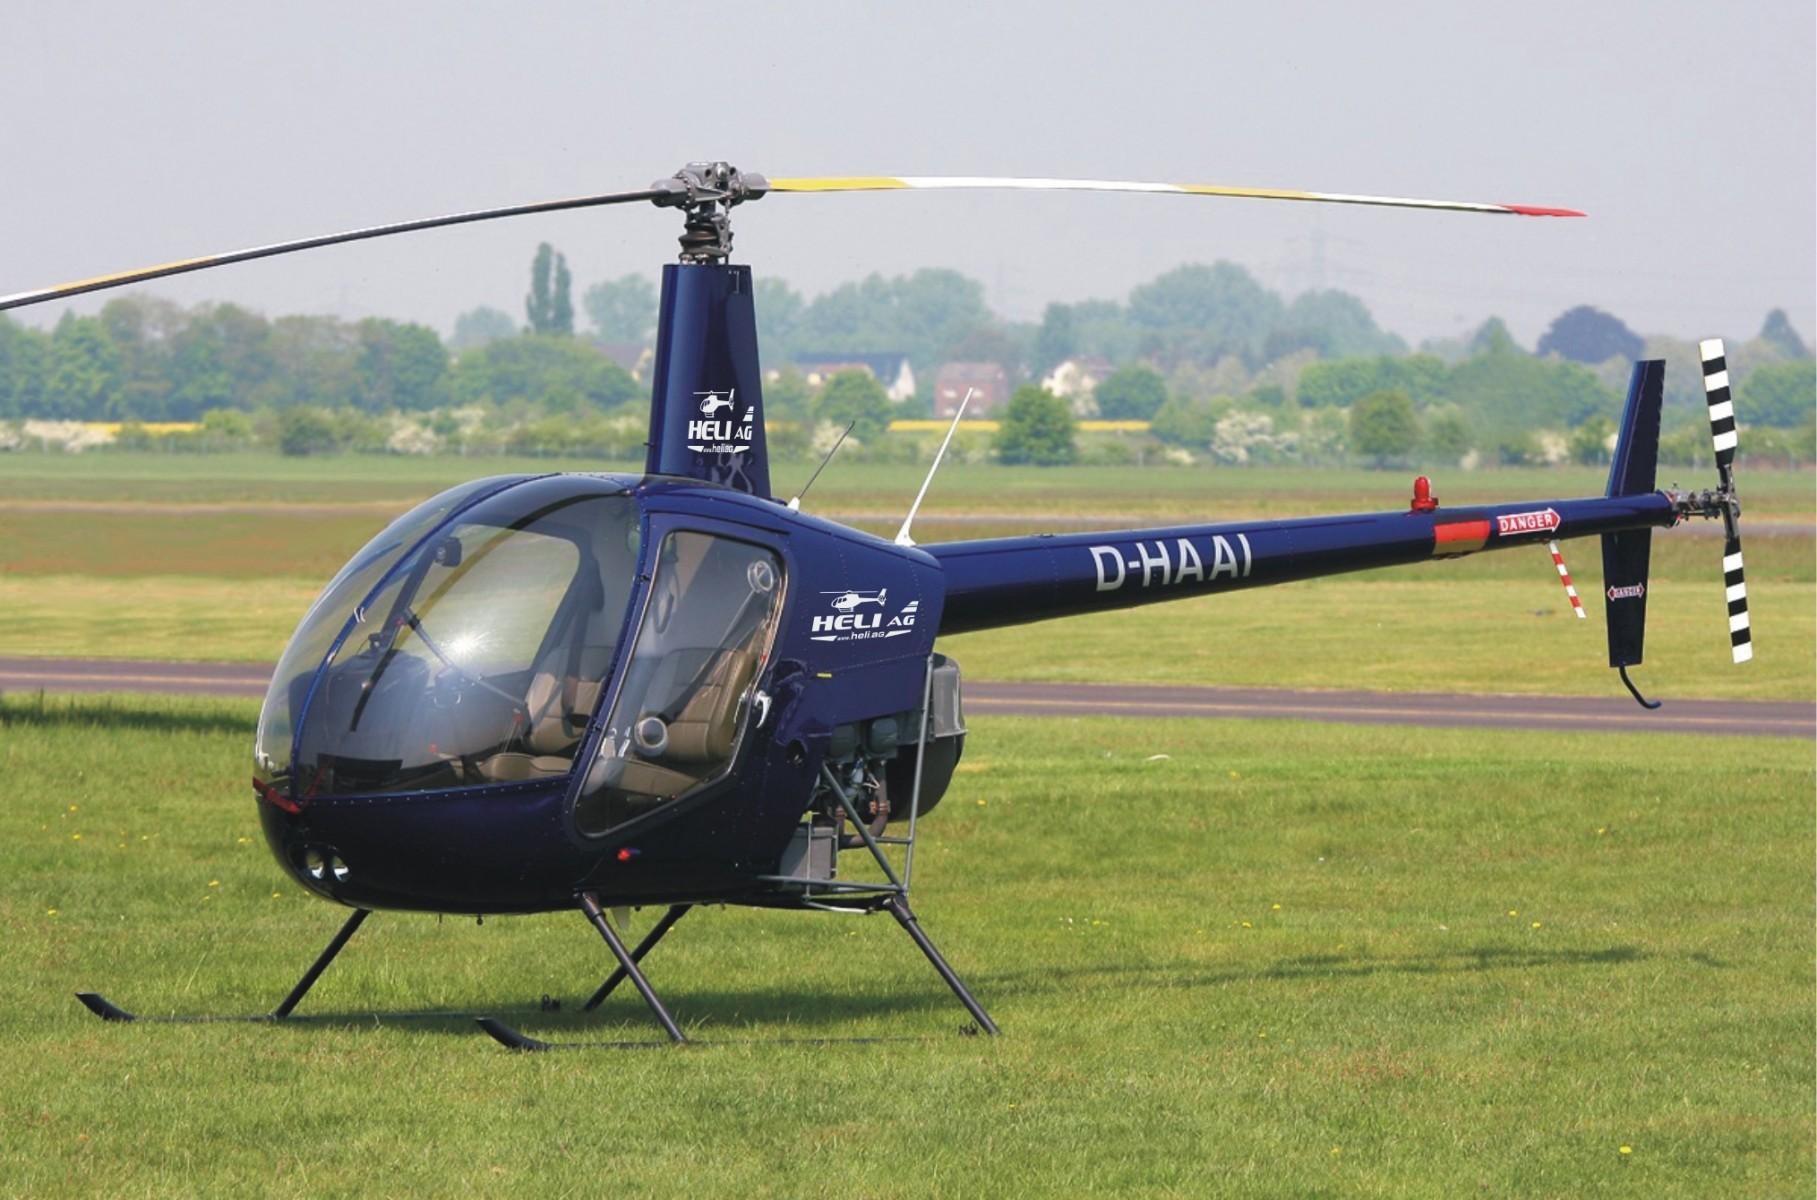 Pilot im Hubschrauberflug bei Hannover